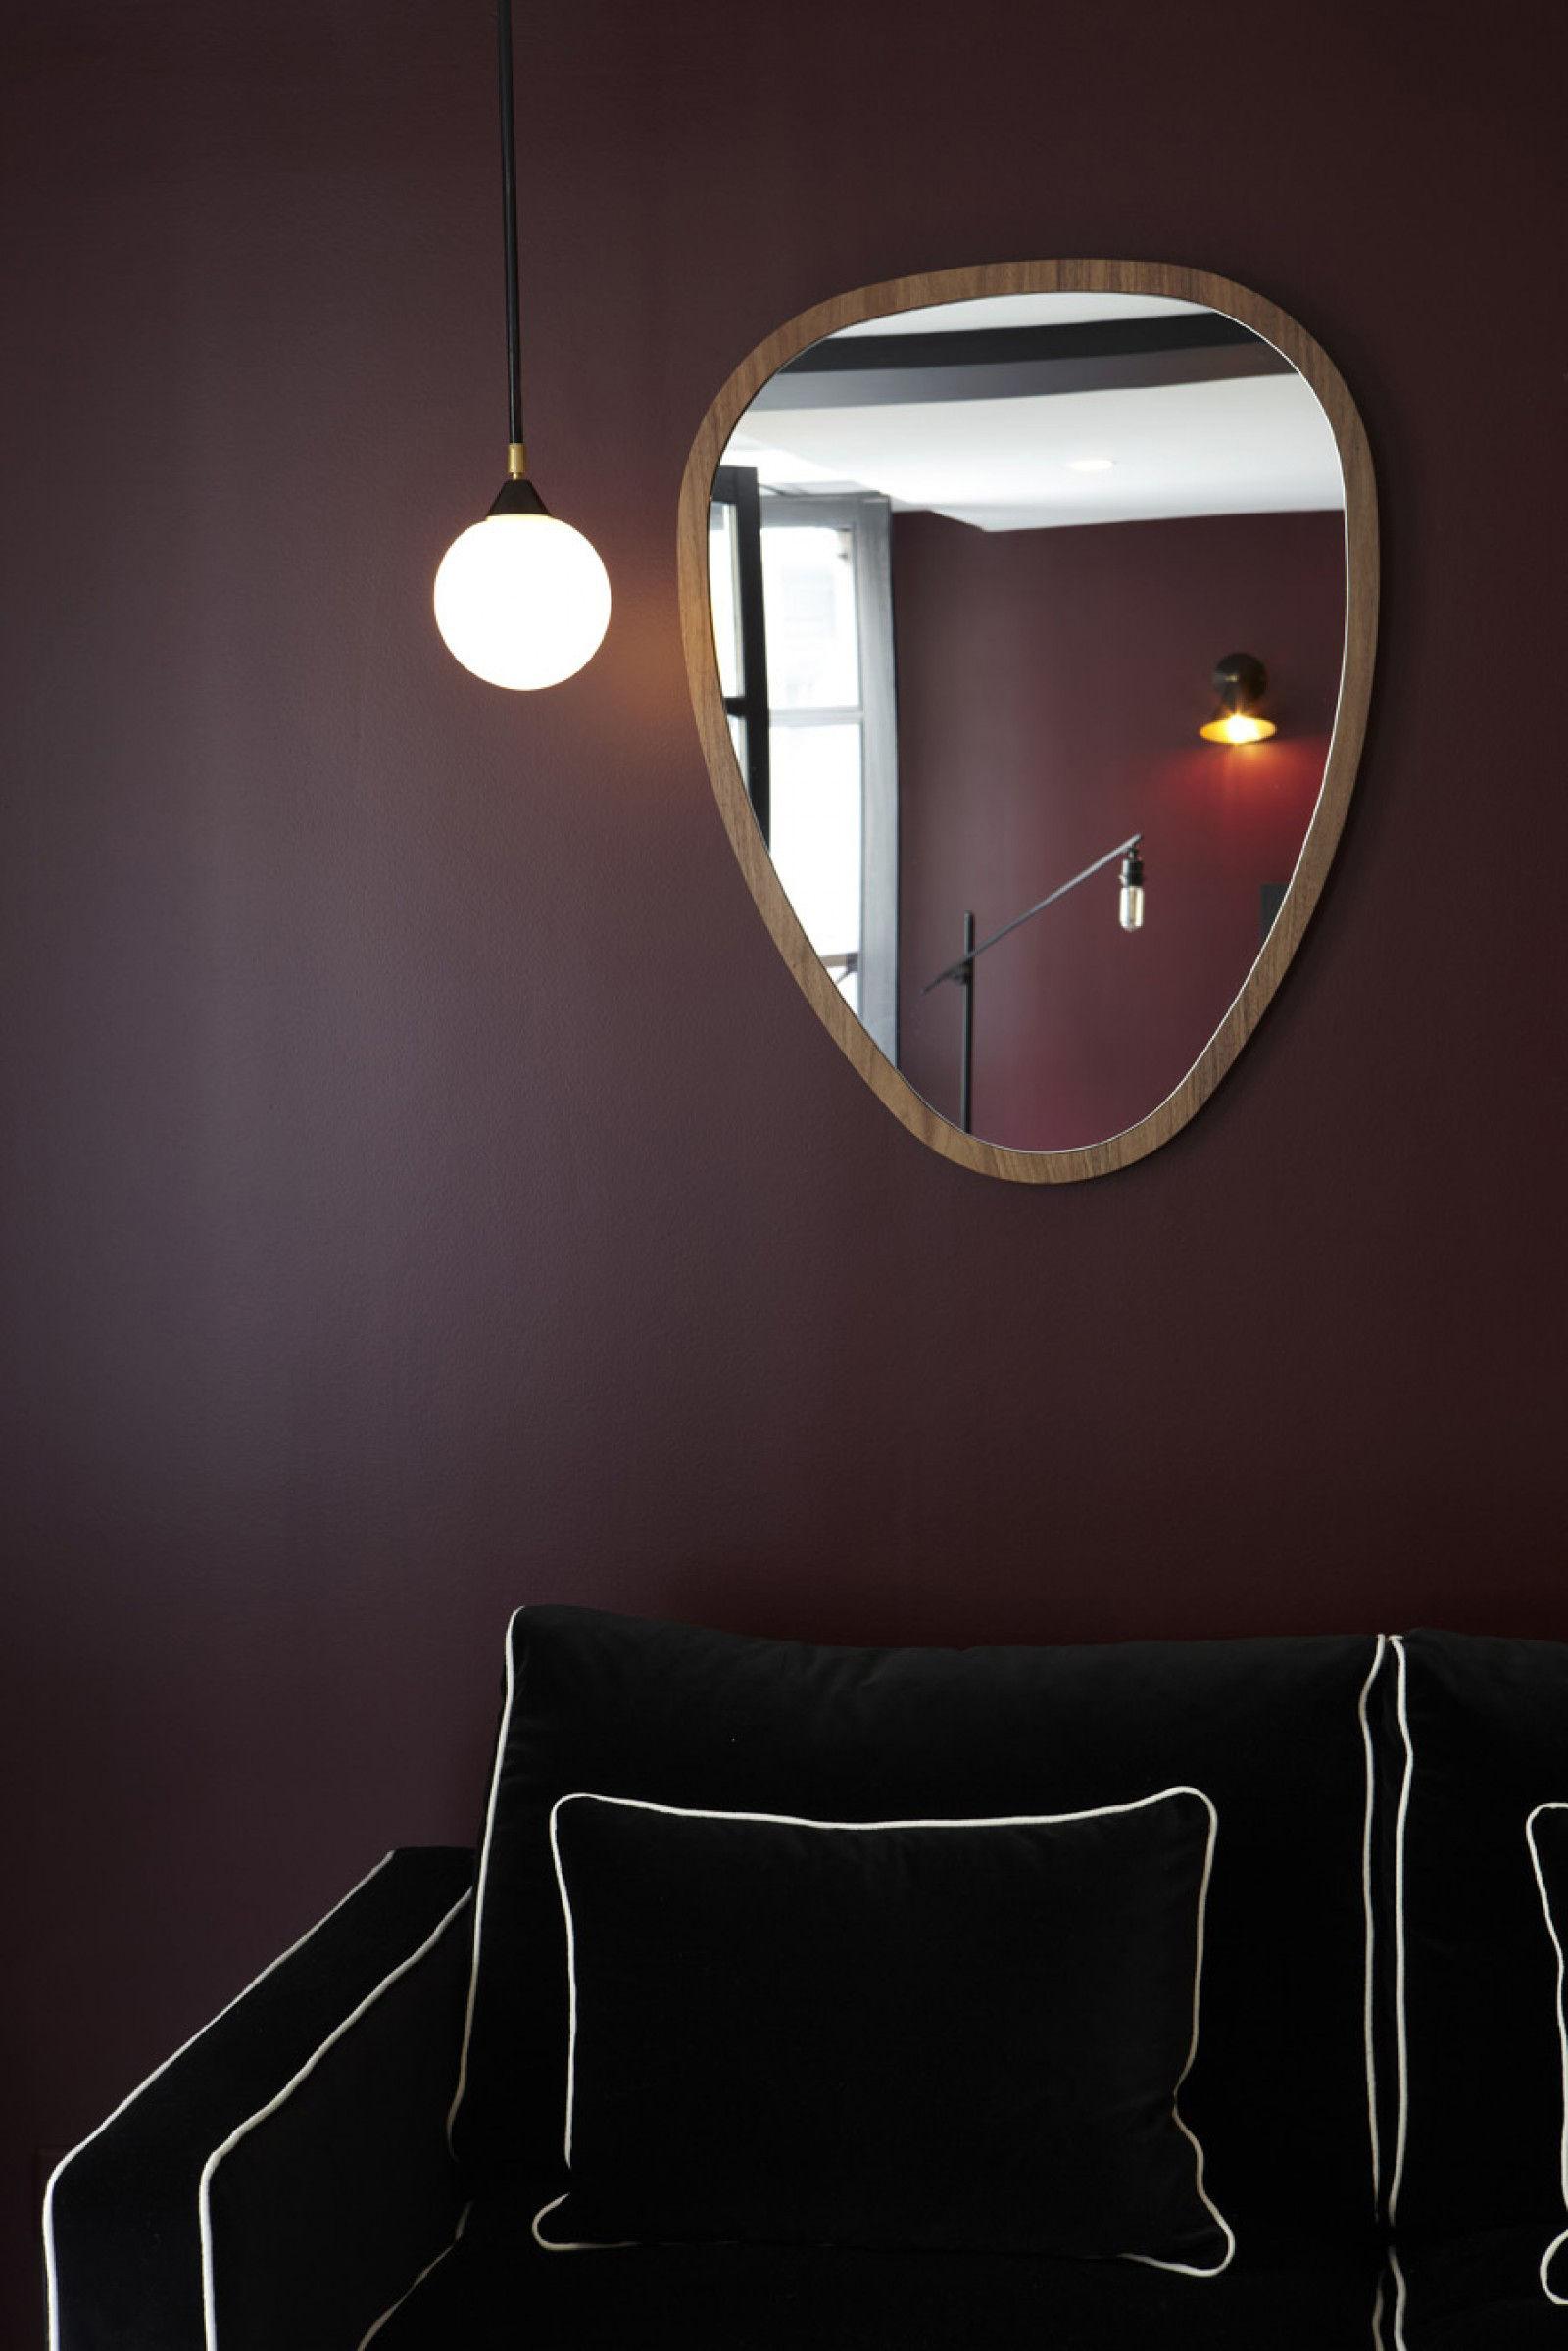 Miroir Collable Of Ovo Wall Mirror Medium 57 X 75 Cm Walnut By Maison